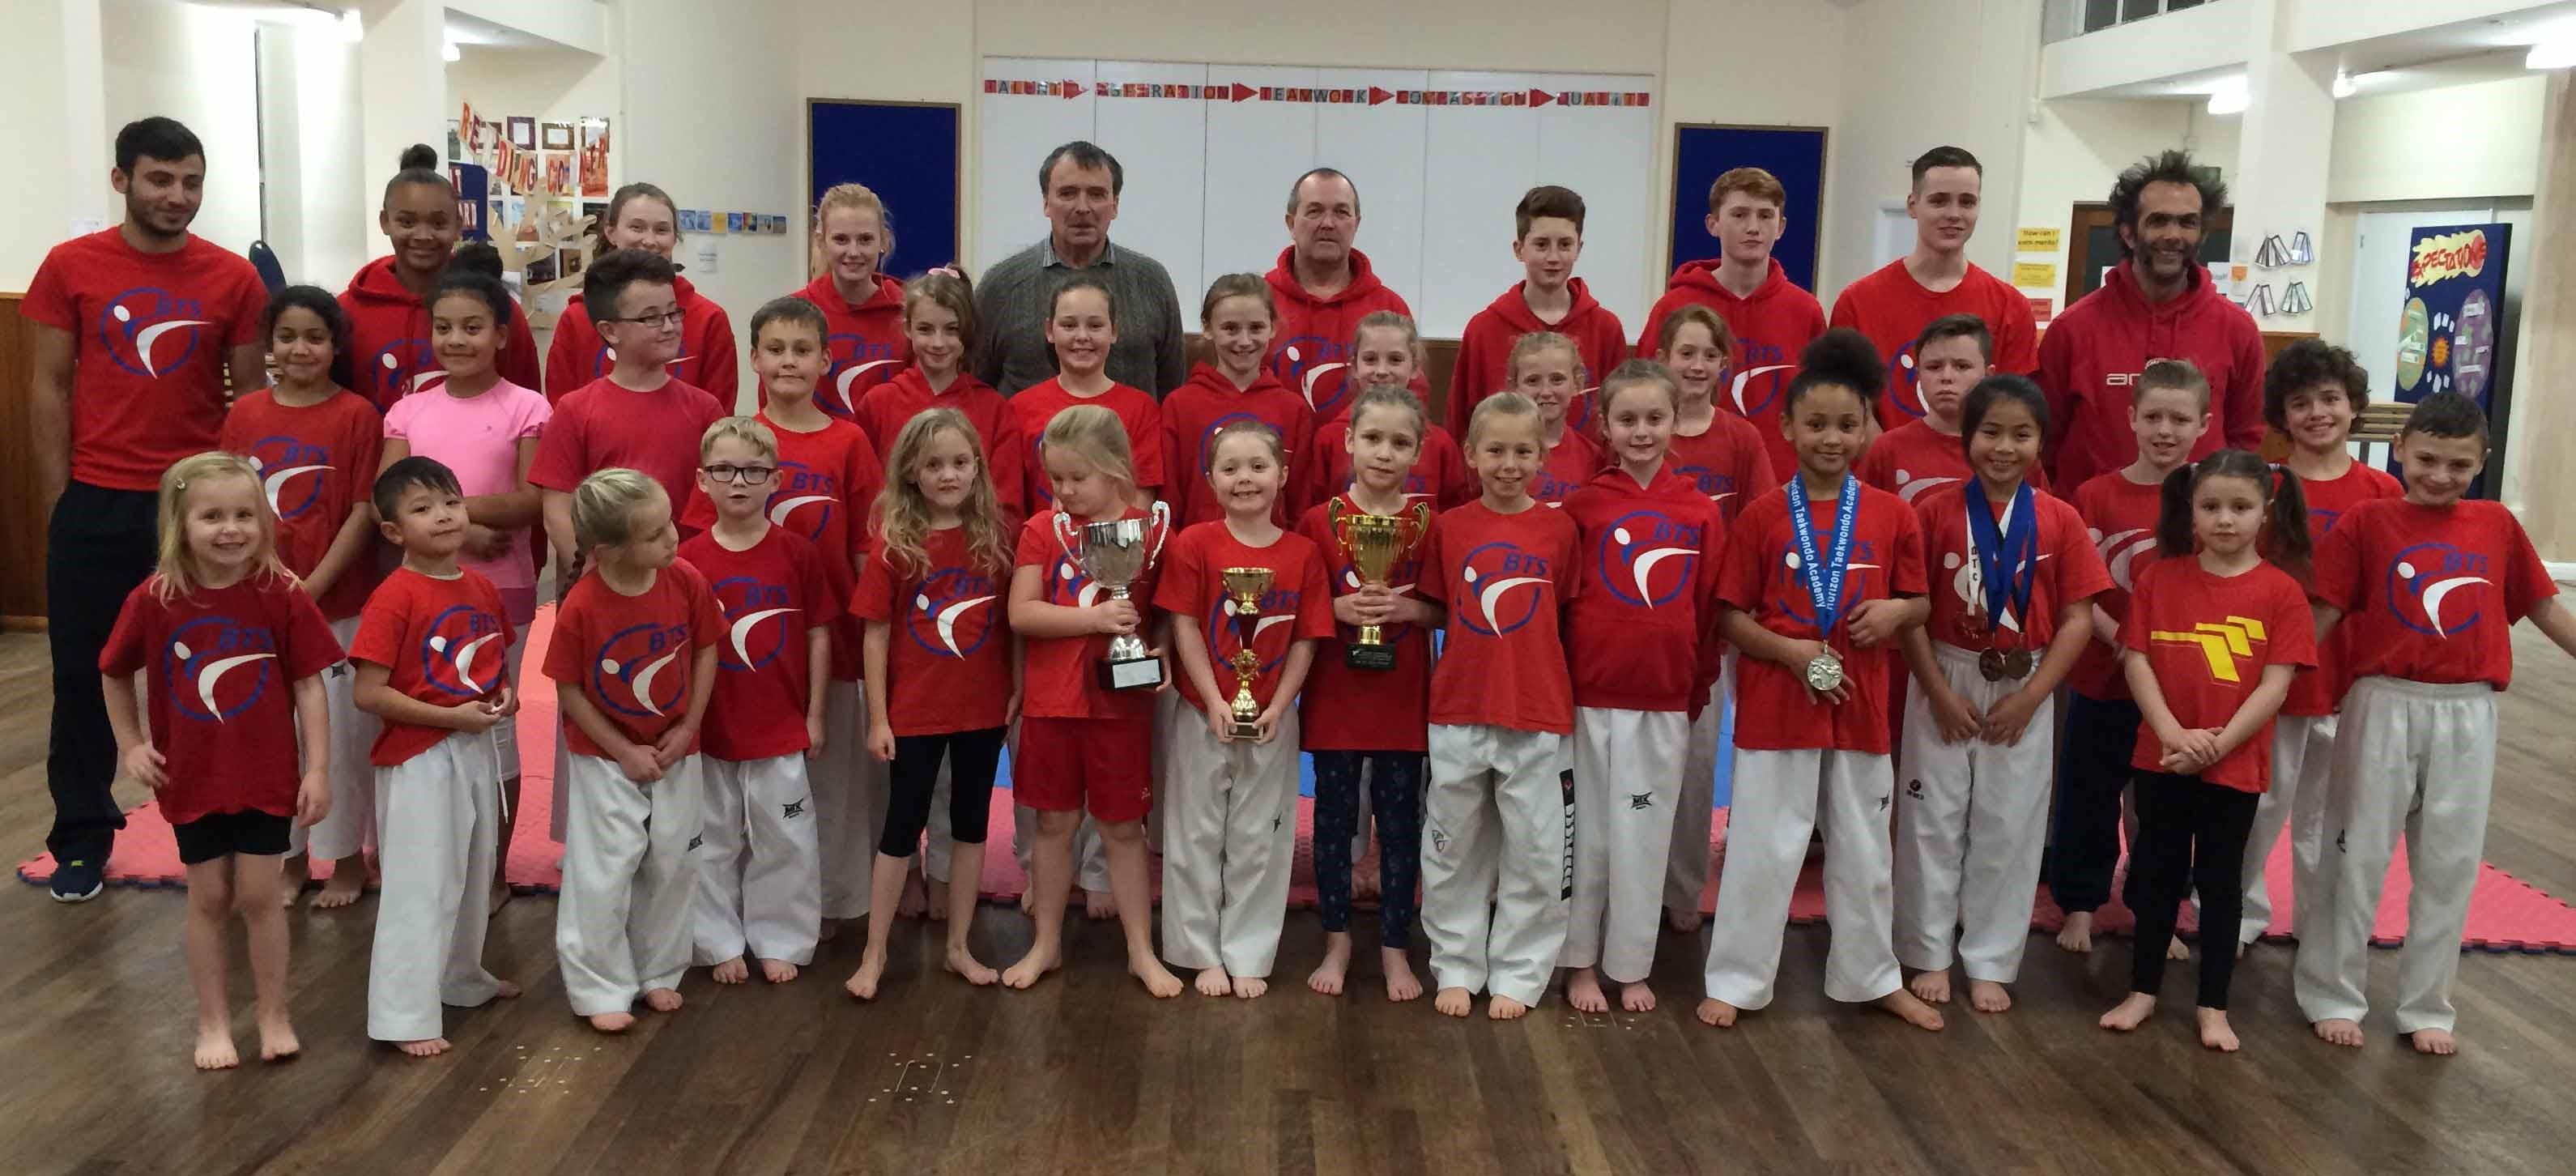 British Taekwondo South (BTS) recognised by GB Taekwondo as latest 'Talent Club'.